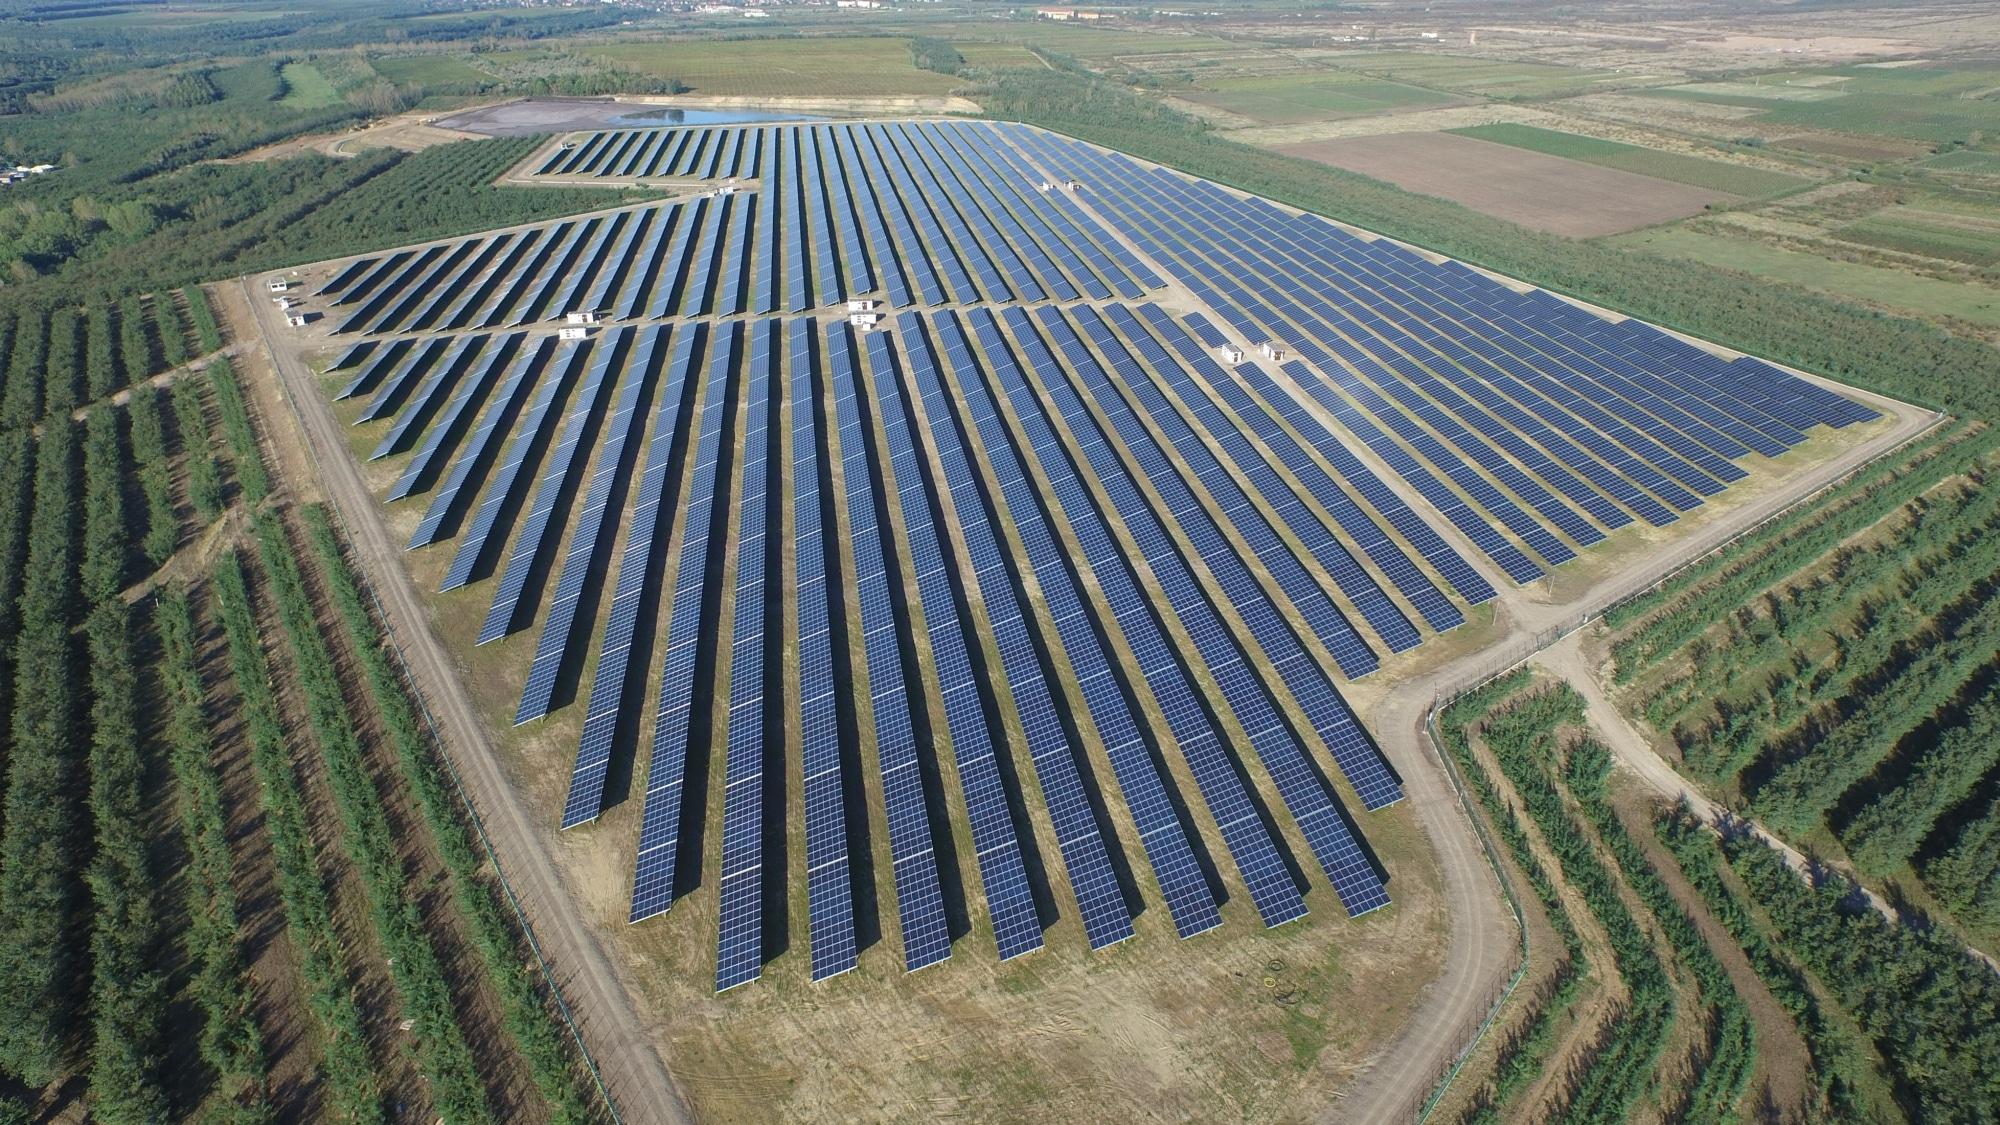 Nlc Inaugurates 130mw Solar Plant In Tamil Nadu India